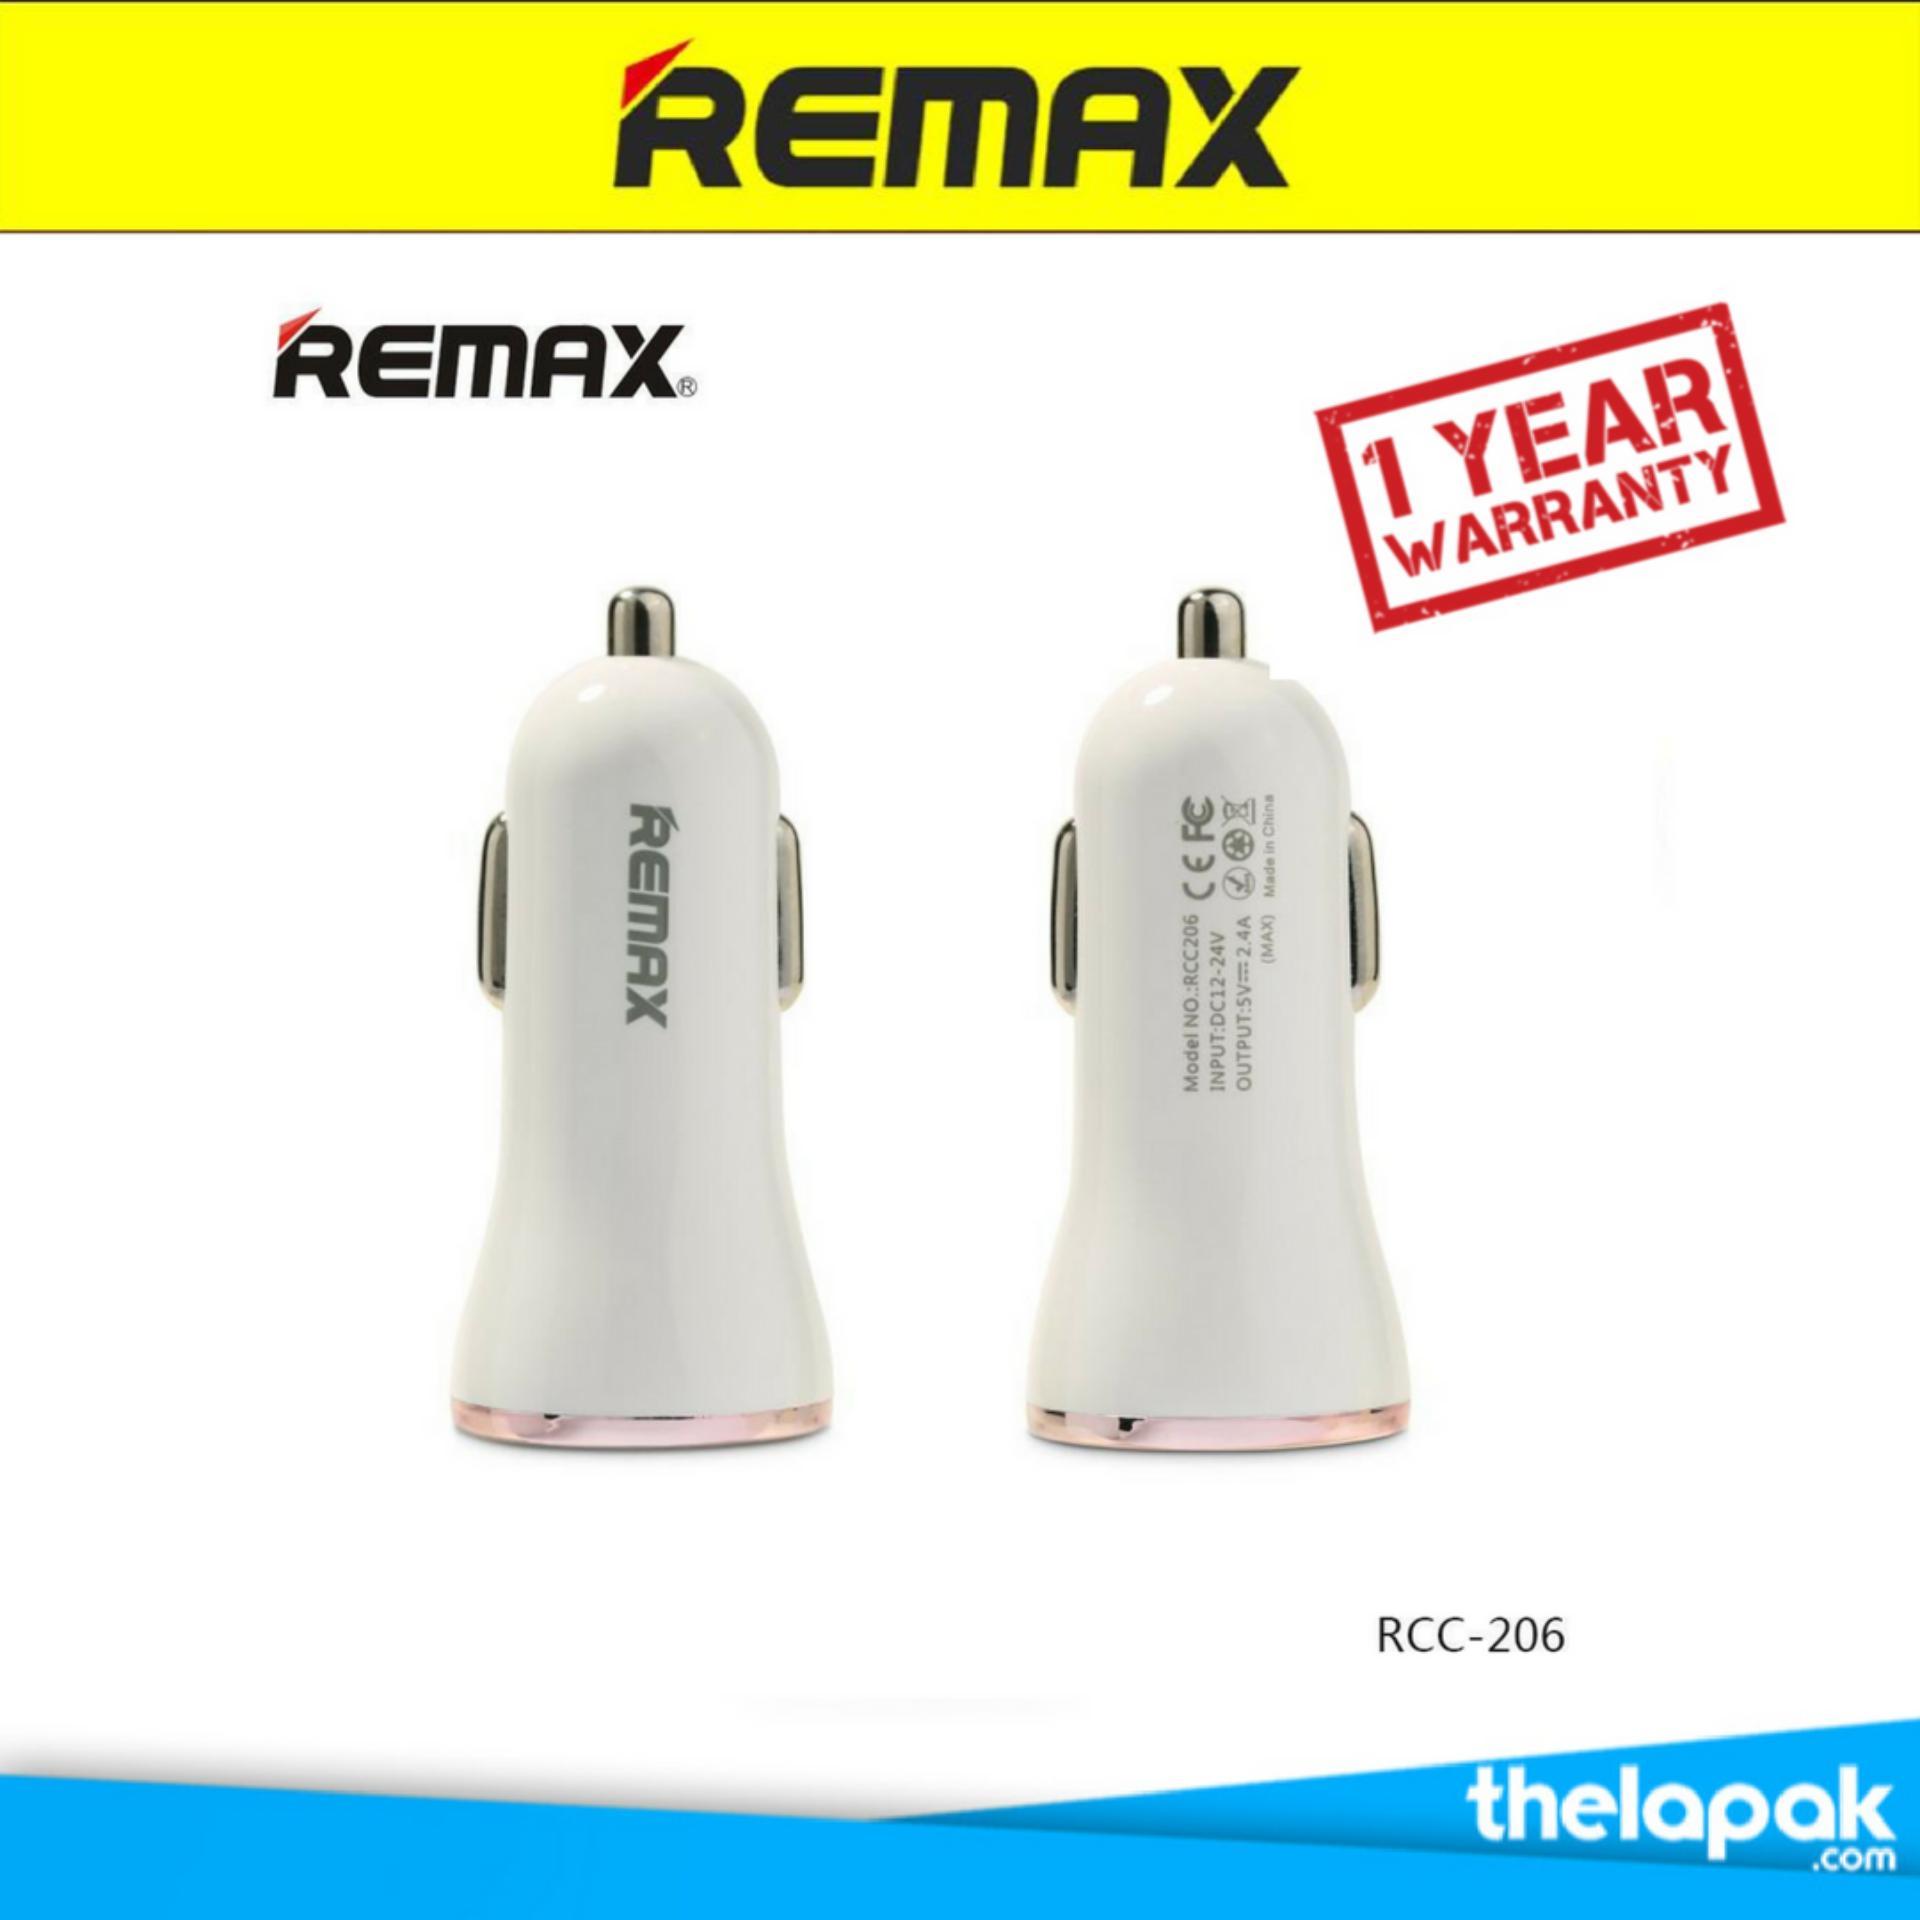 Beli Remax Car Charger Dolphin 3 Ports Usb 3 4A Remax Dengan Harga Terjangkau